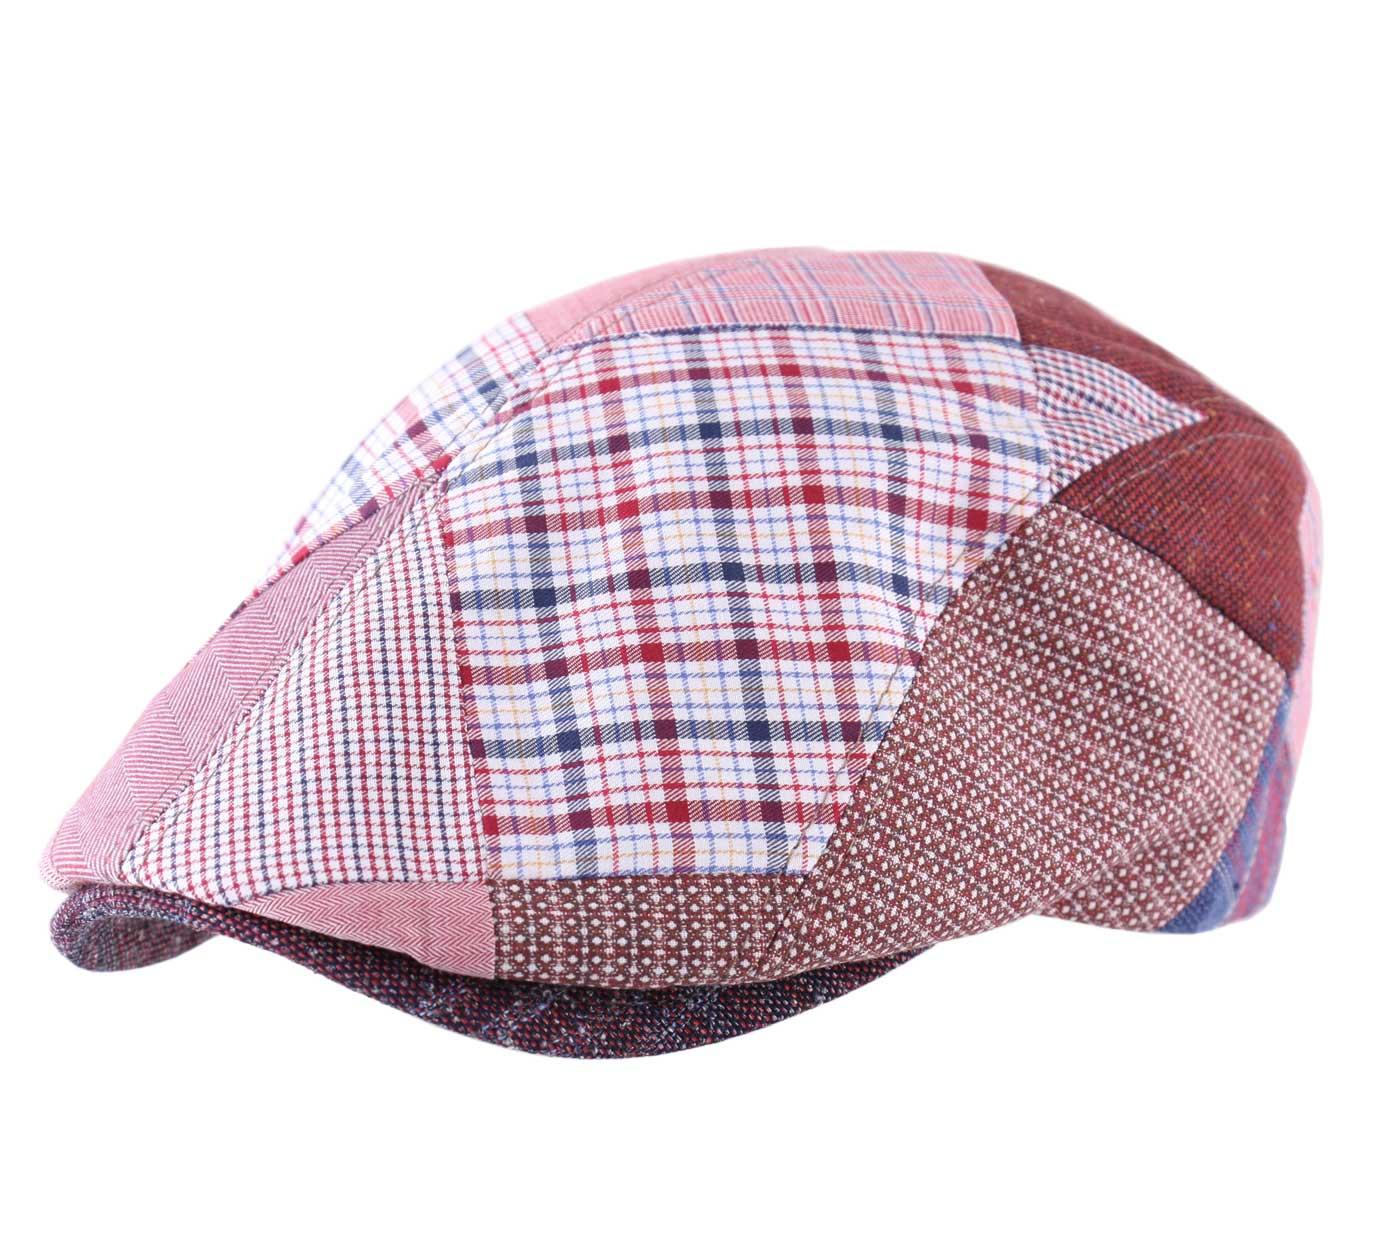 beret patchwork classic cap patchwork classic italy. Black Bedroom Furniture Sets. Home Design Ideas